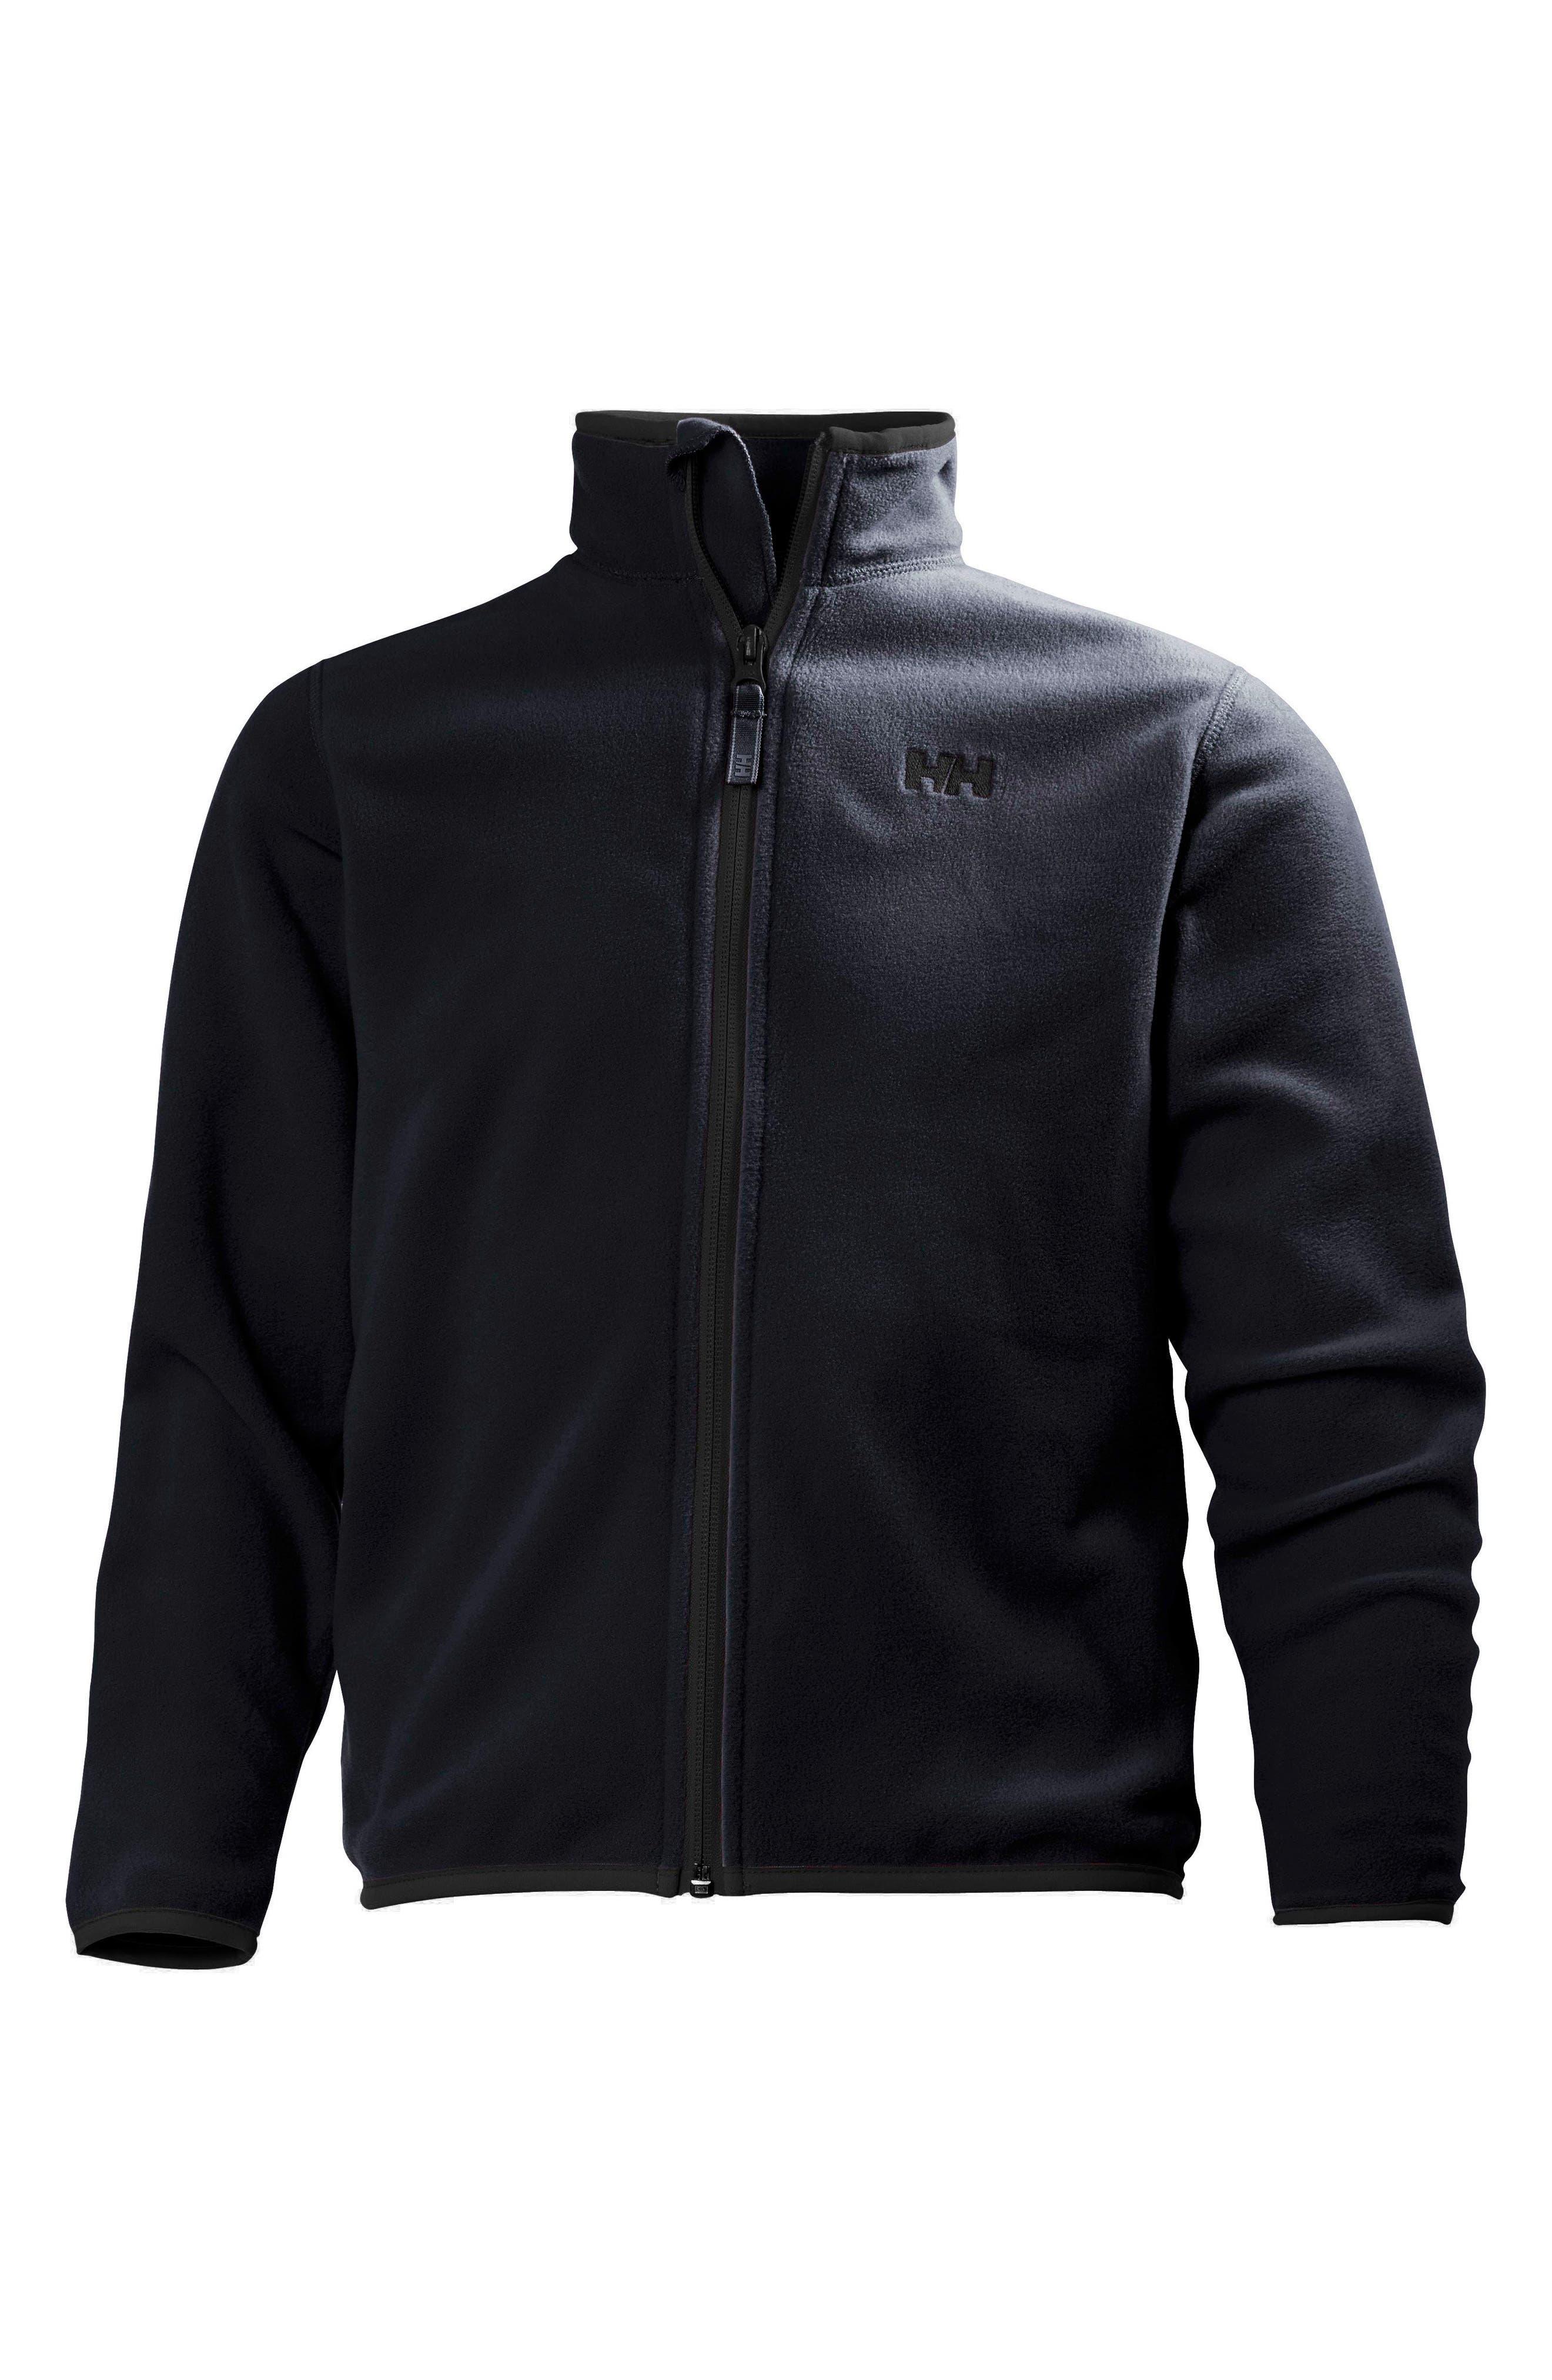 Jr. Daybreaker Polartec<sup>®</sup> Fleece Jacket,                         Main,                         color, Graphite Blue